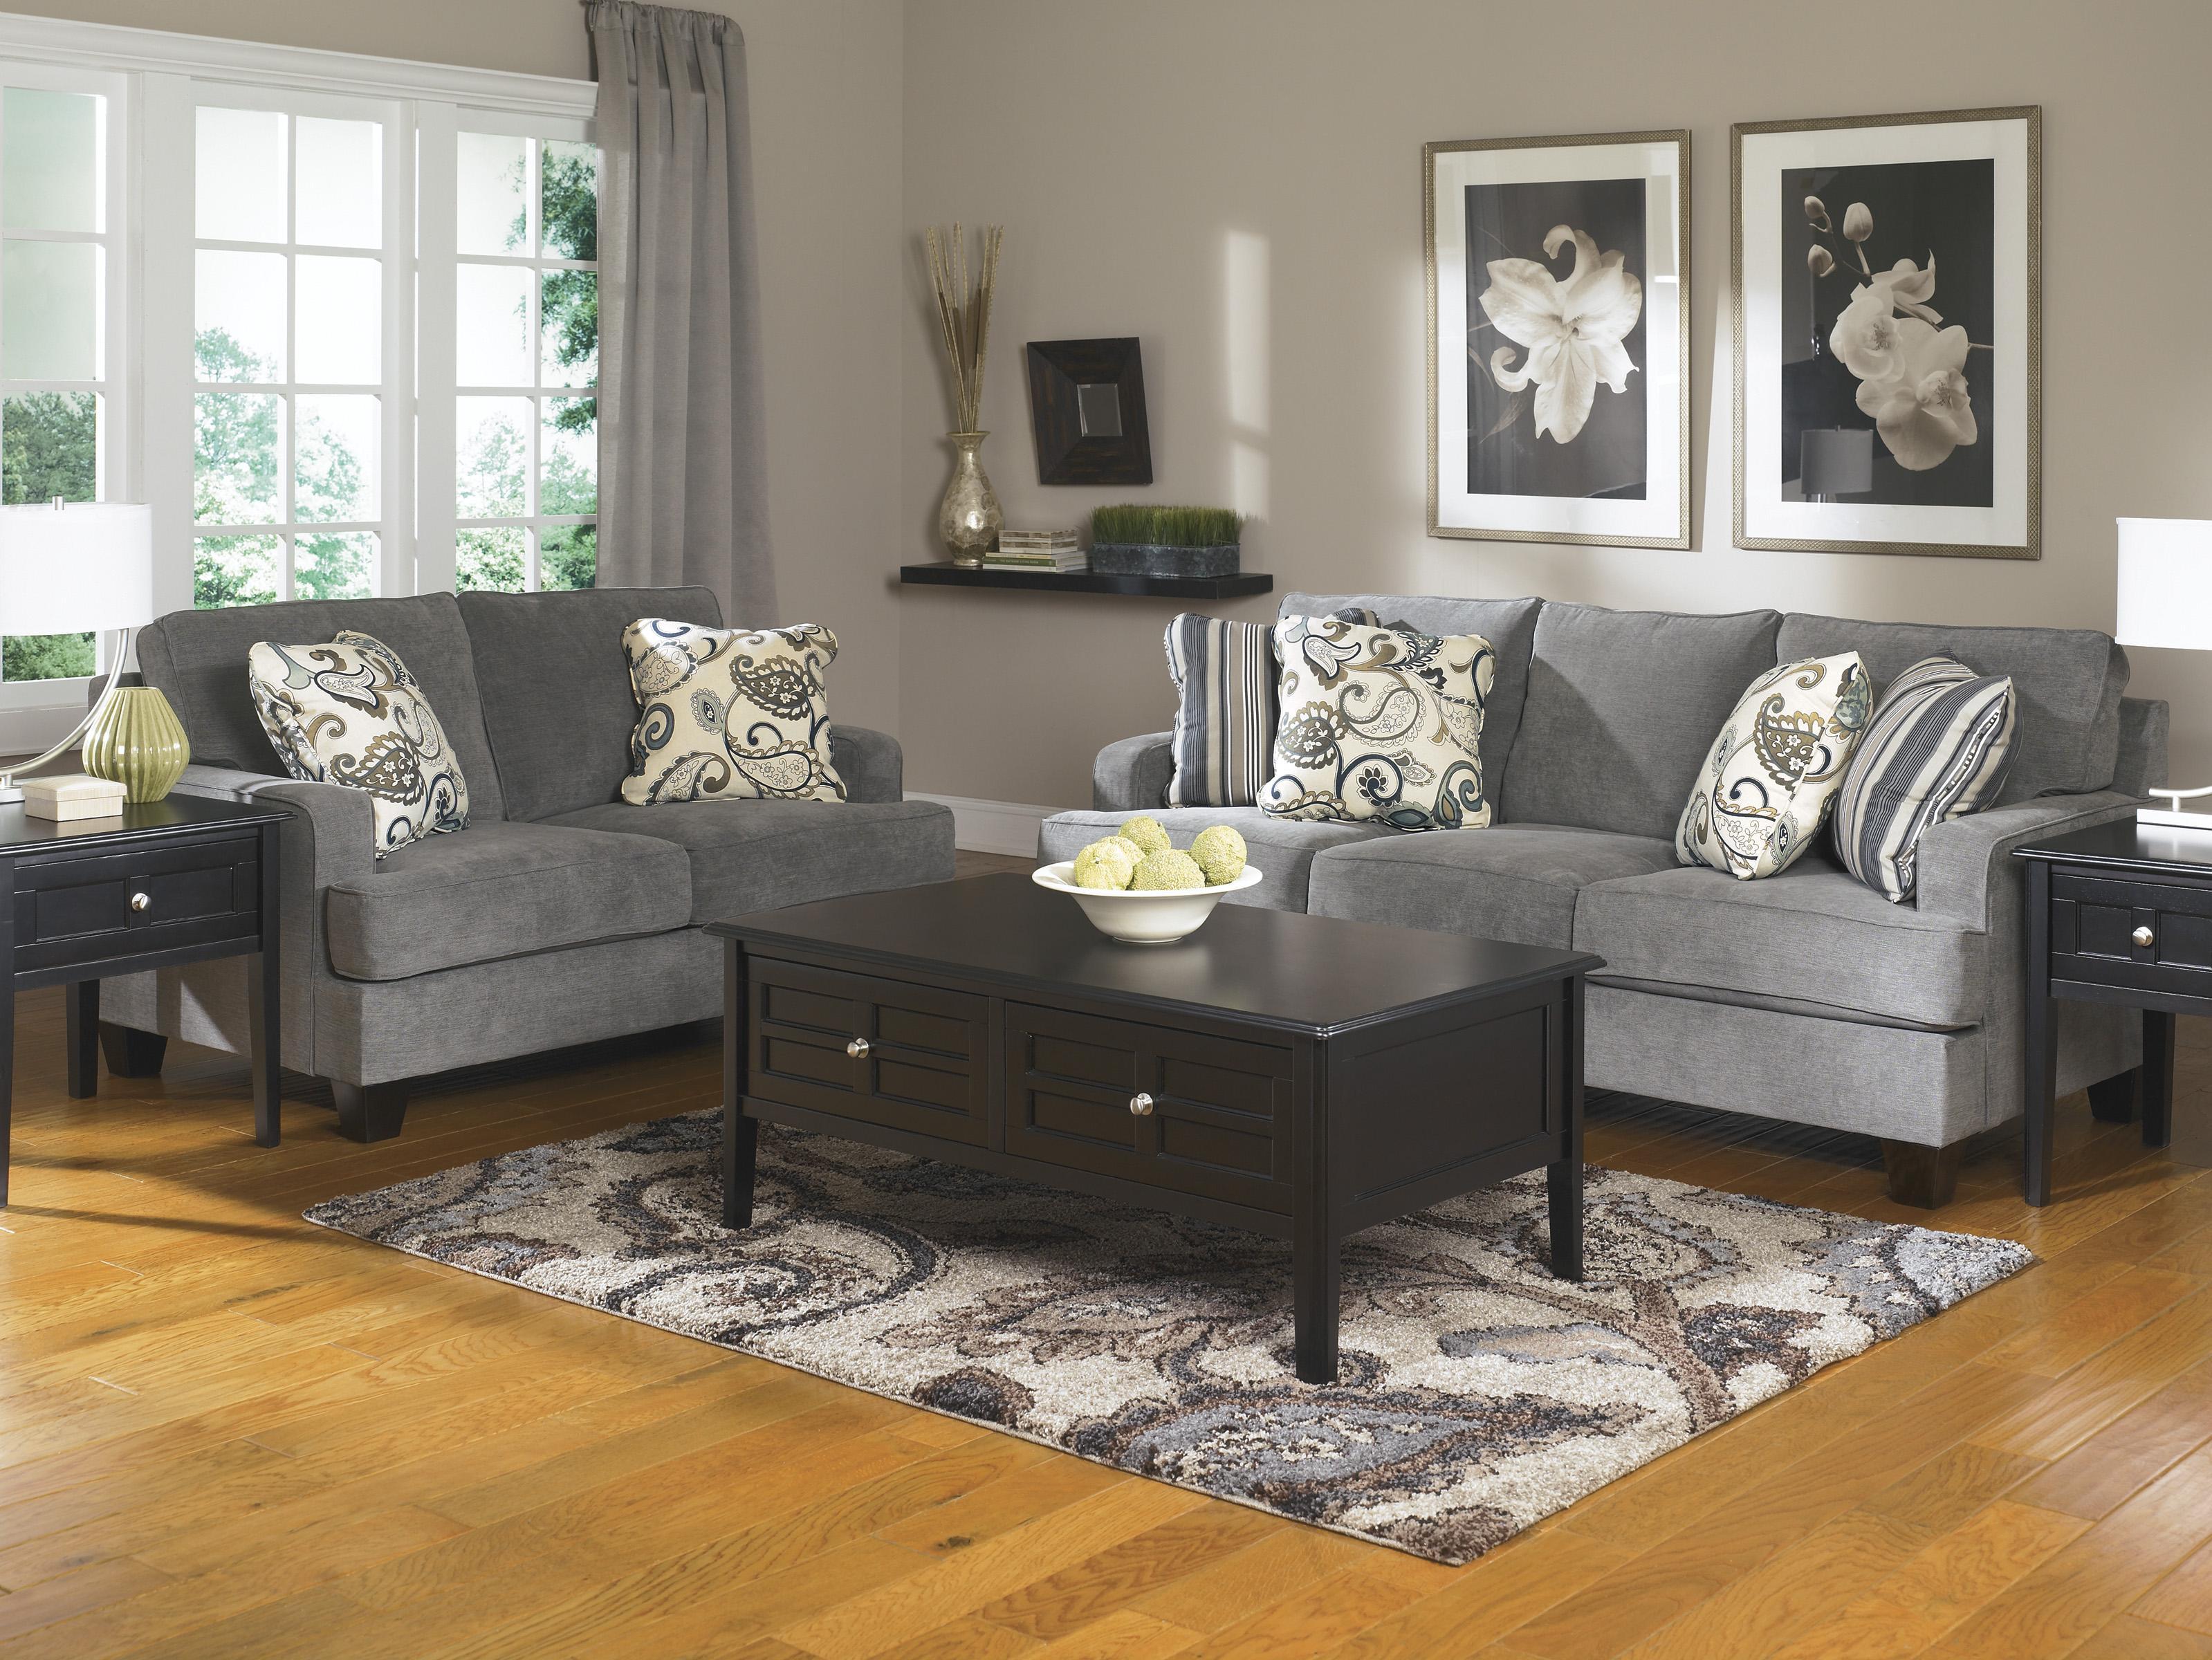 Ashley Furniture Yvette Steel Stationary Living Room Group